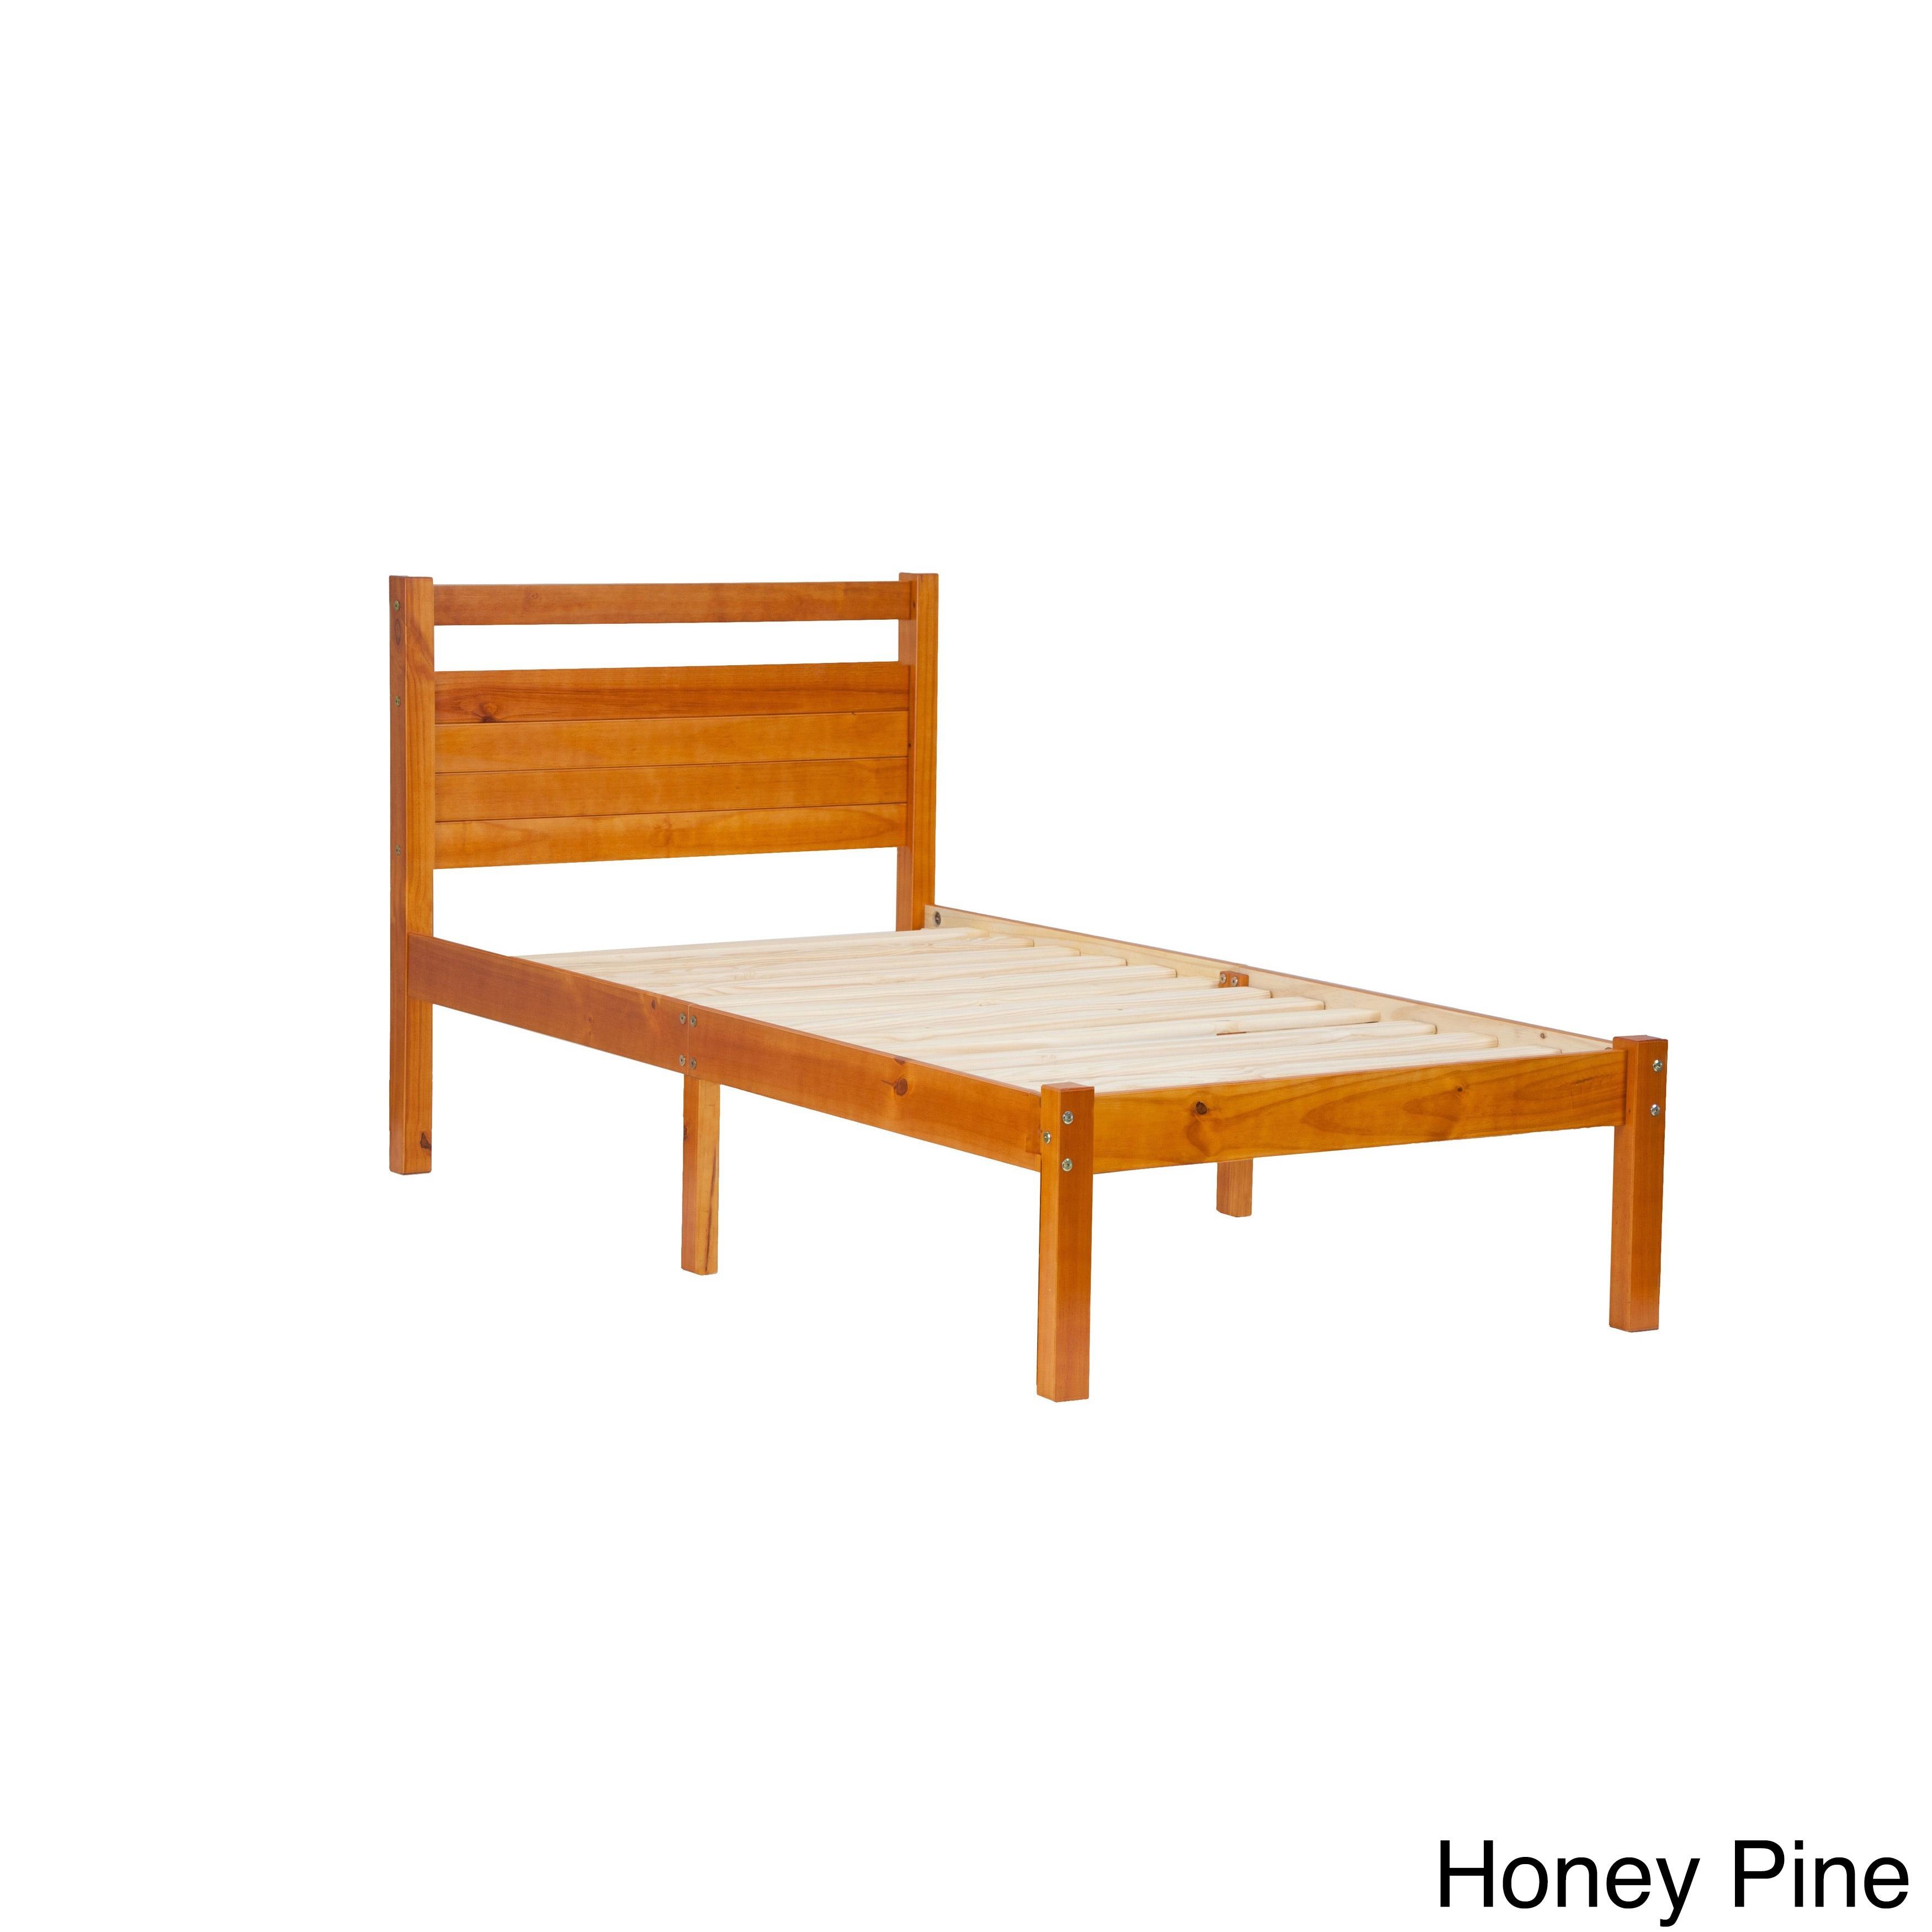 Bronx Pine Wood Twin-size Platform Bed (Honey Pine), Gold